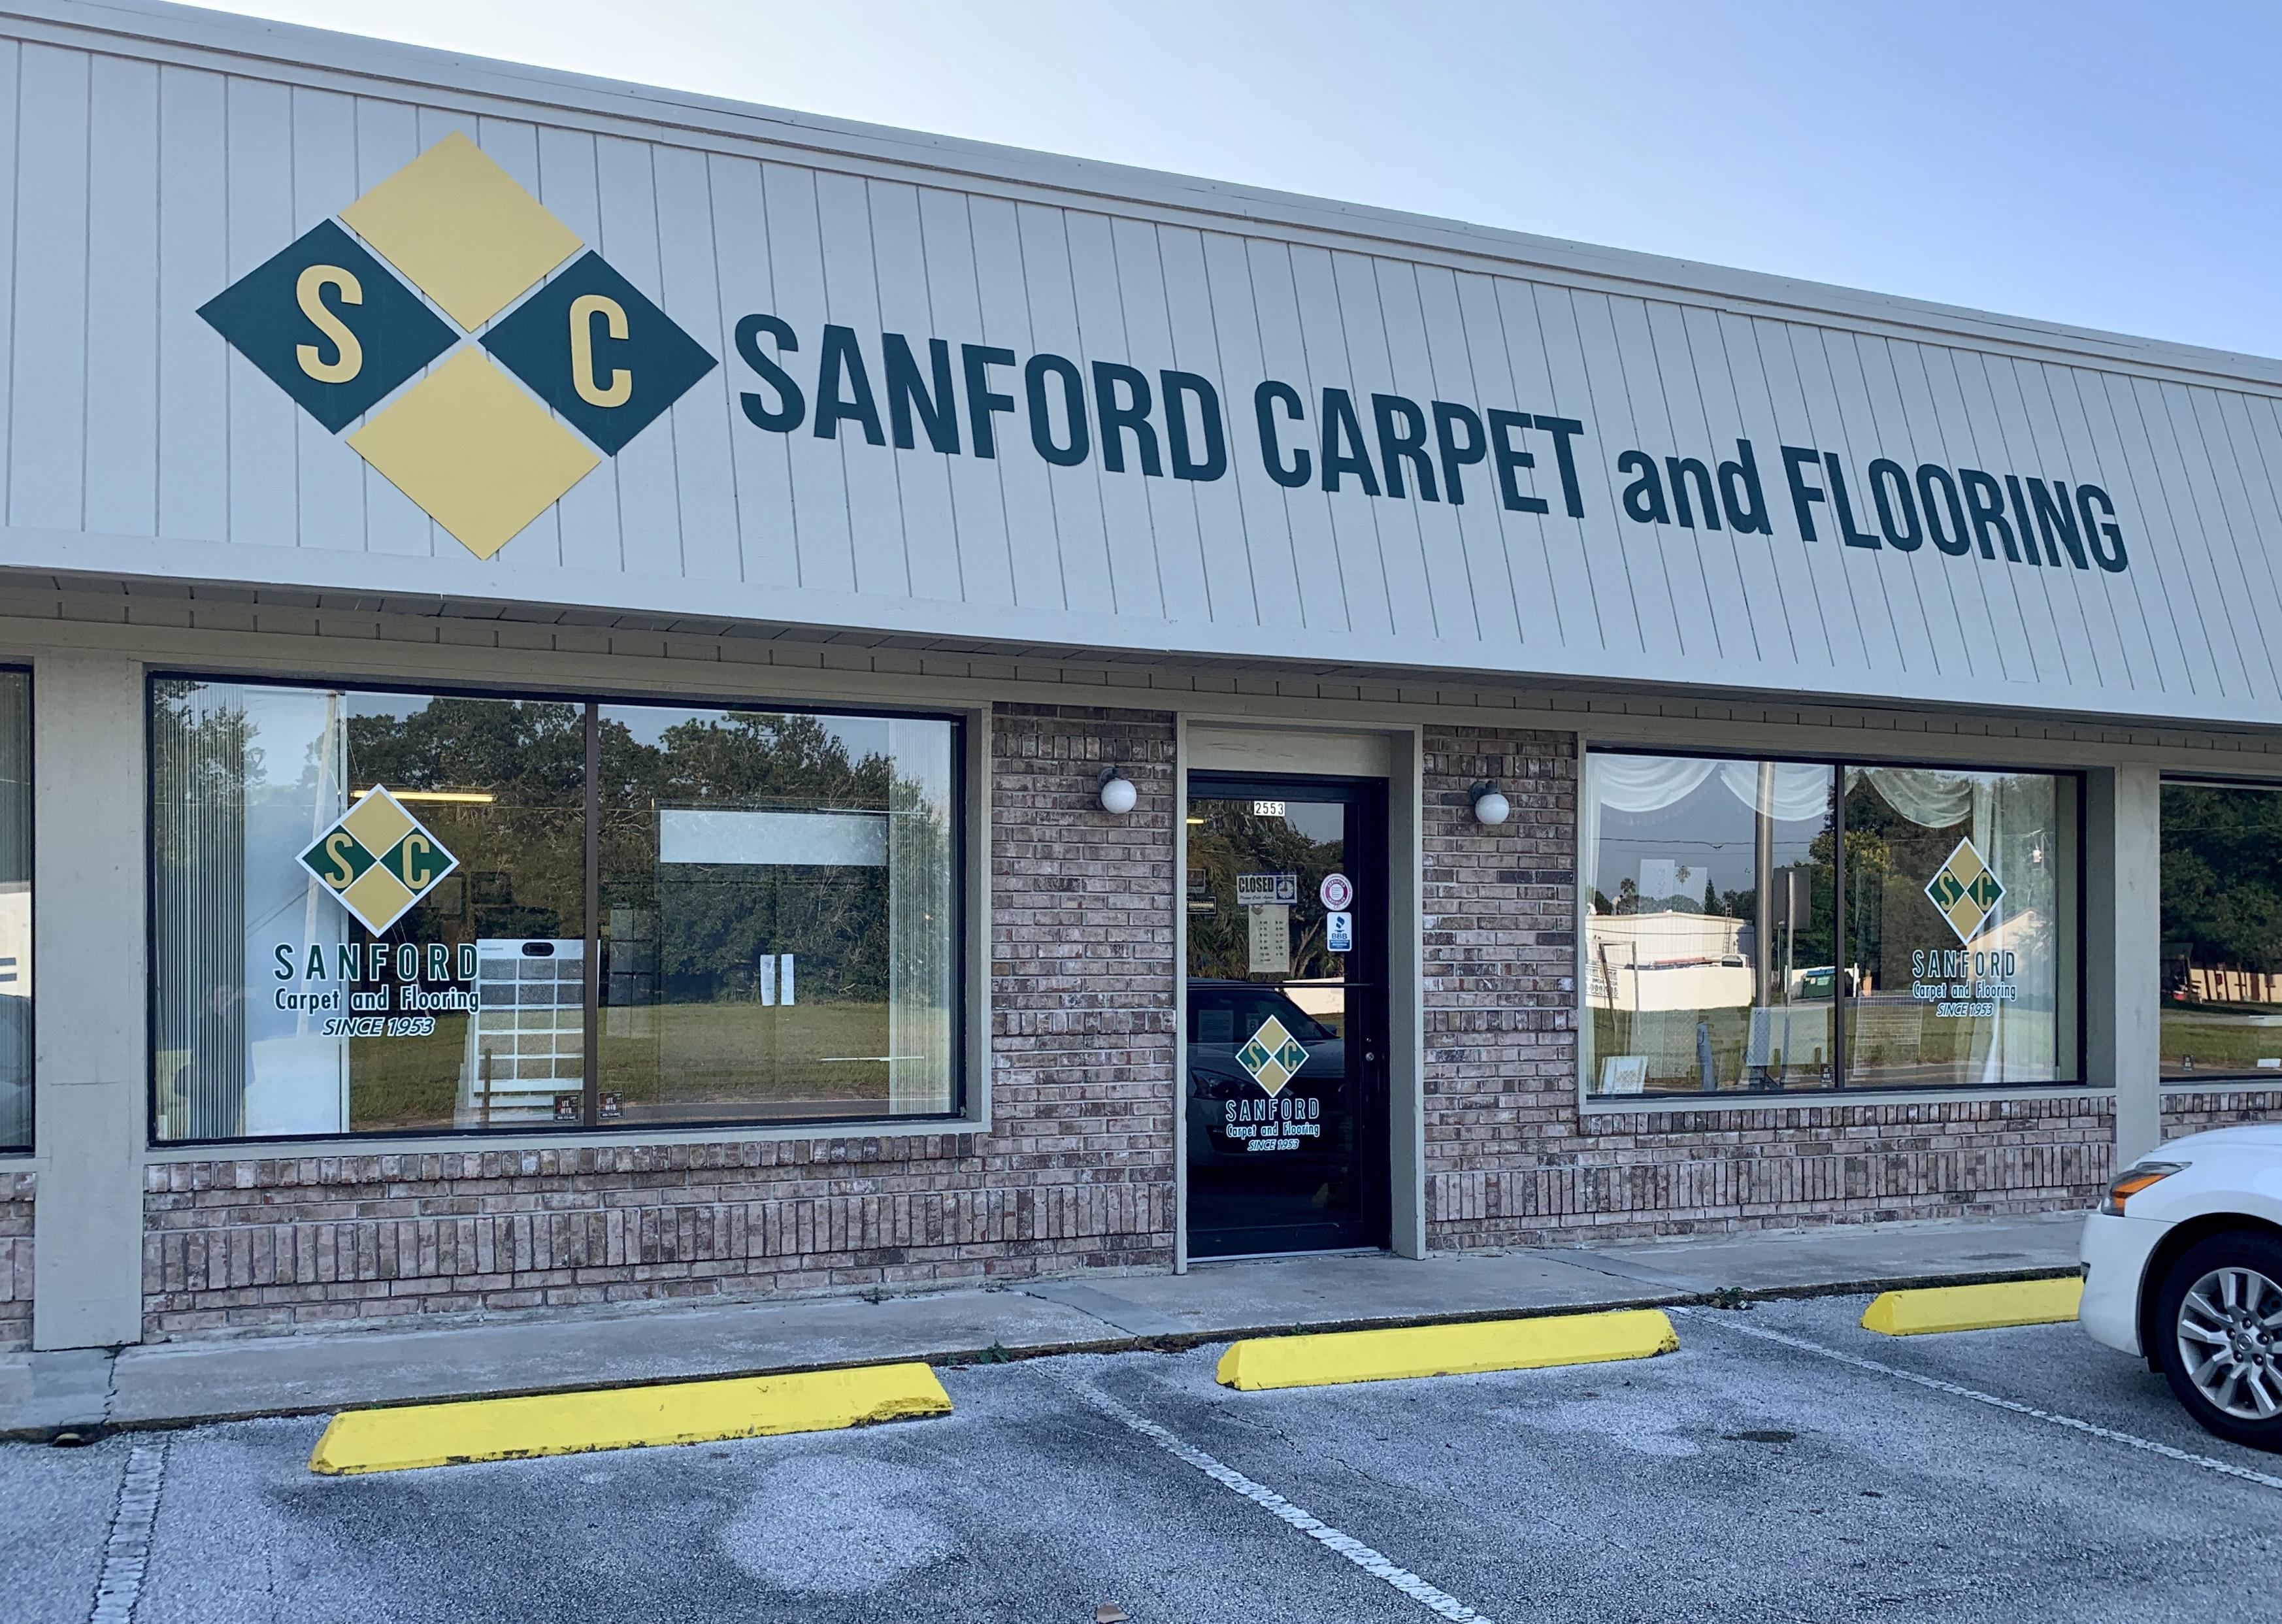 Sanford Carpet and Flooring - 2443 Shelby Park Dr Katy, TX 77450